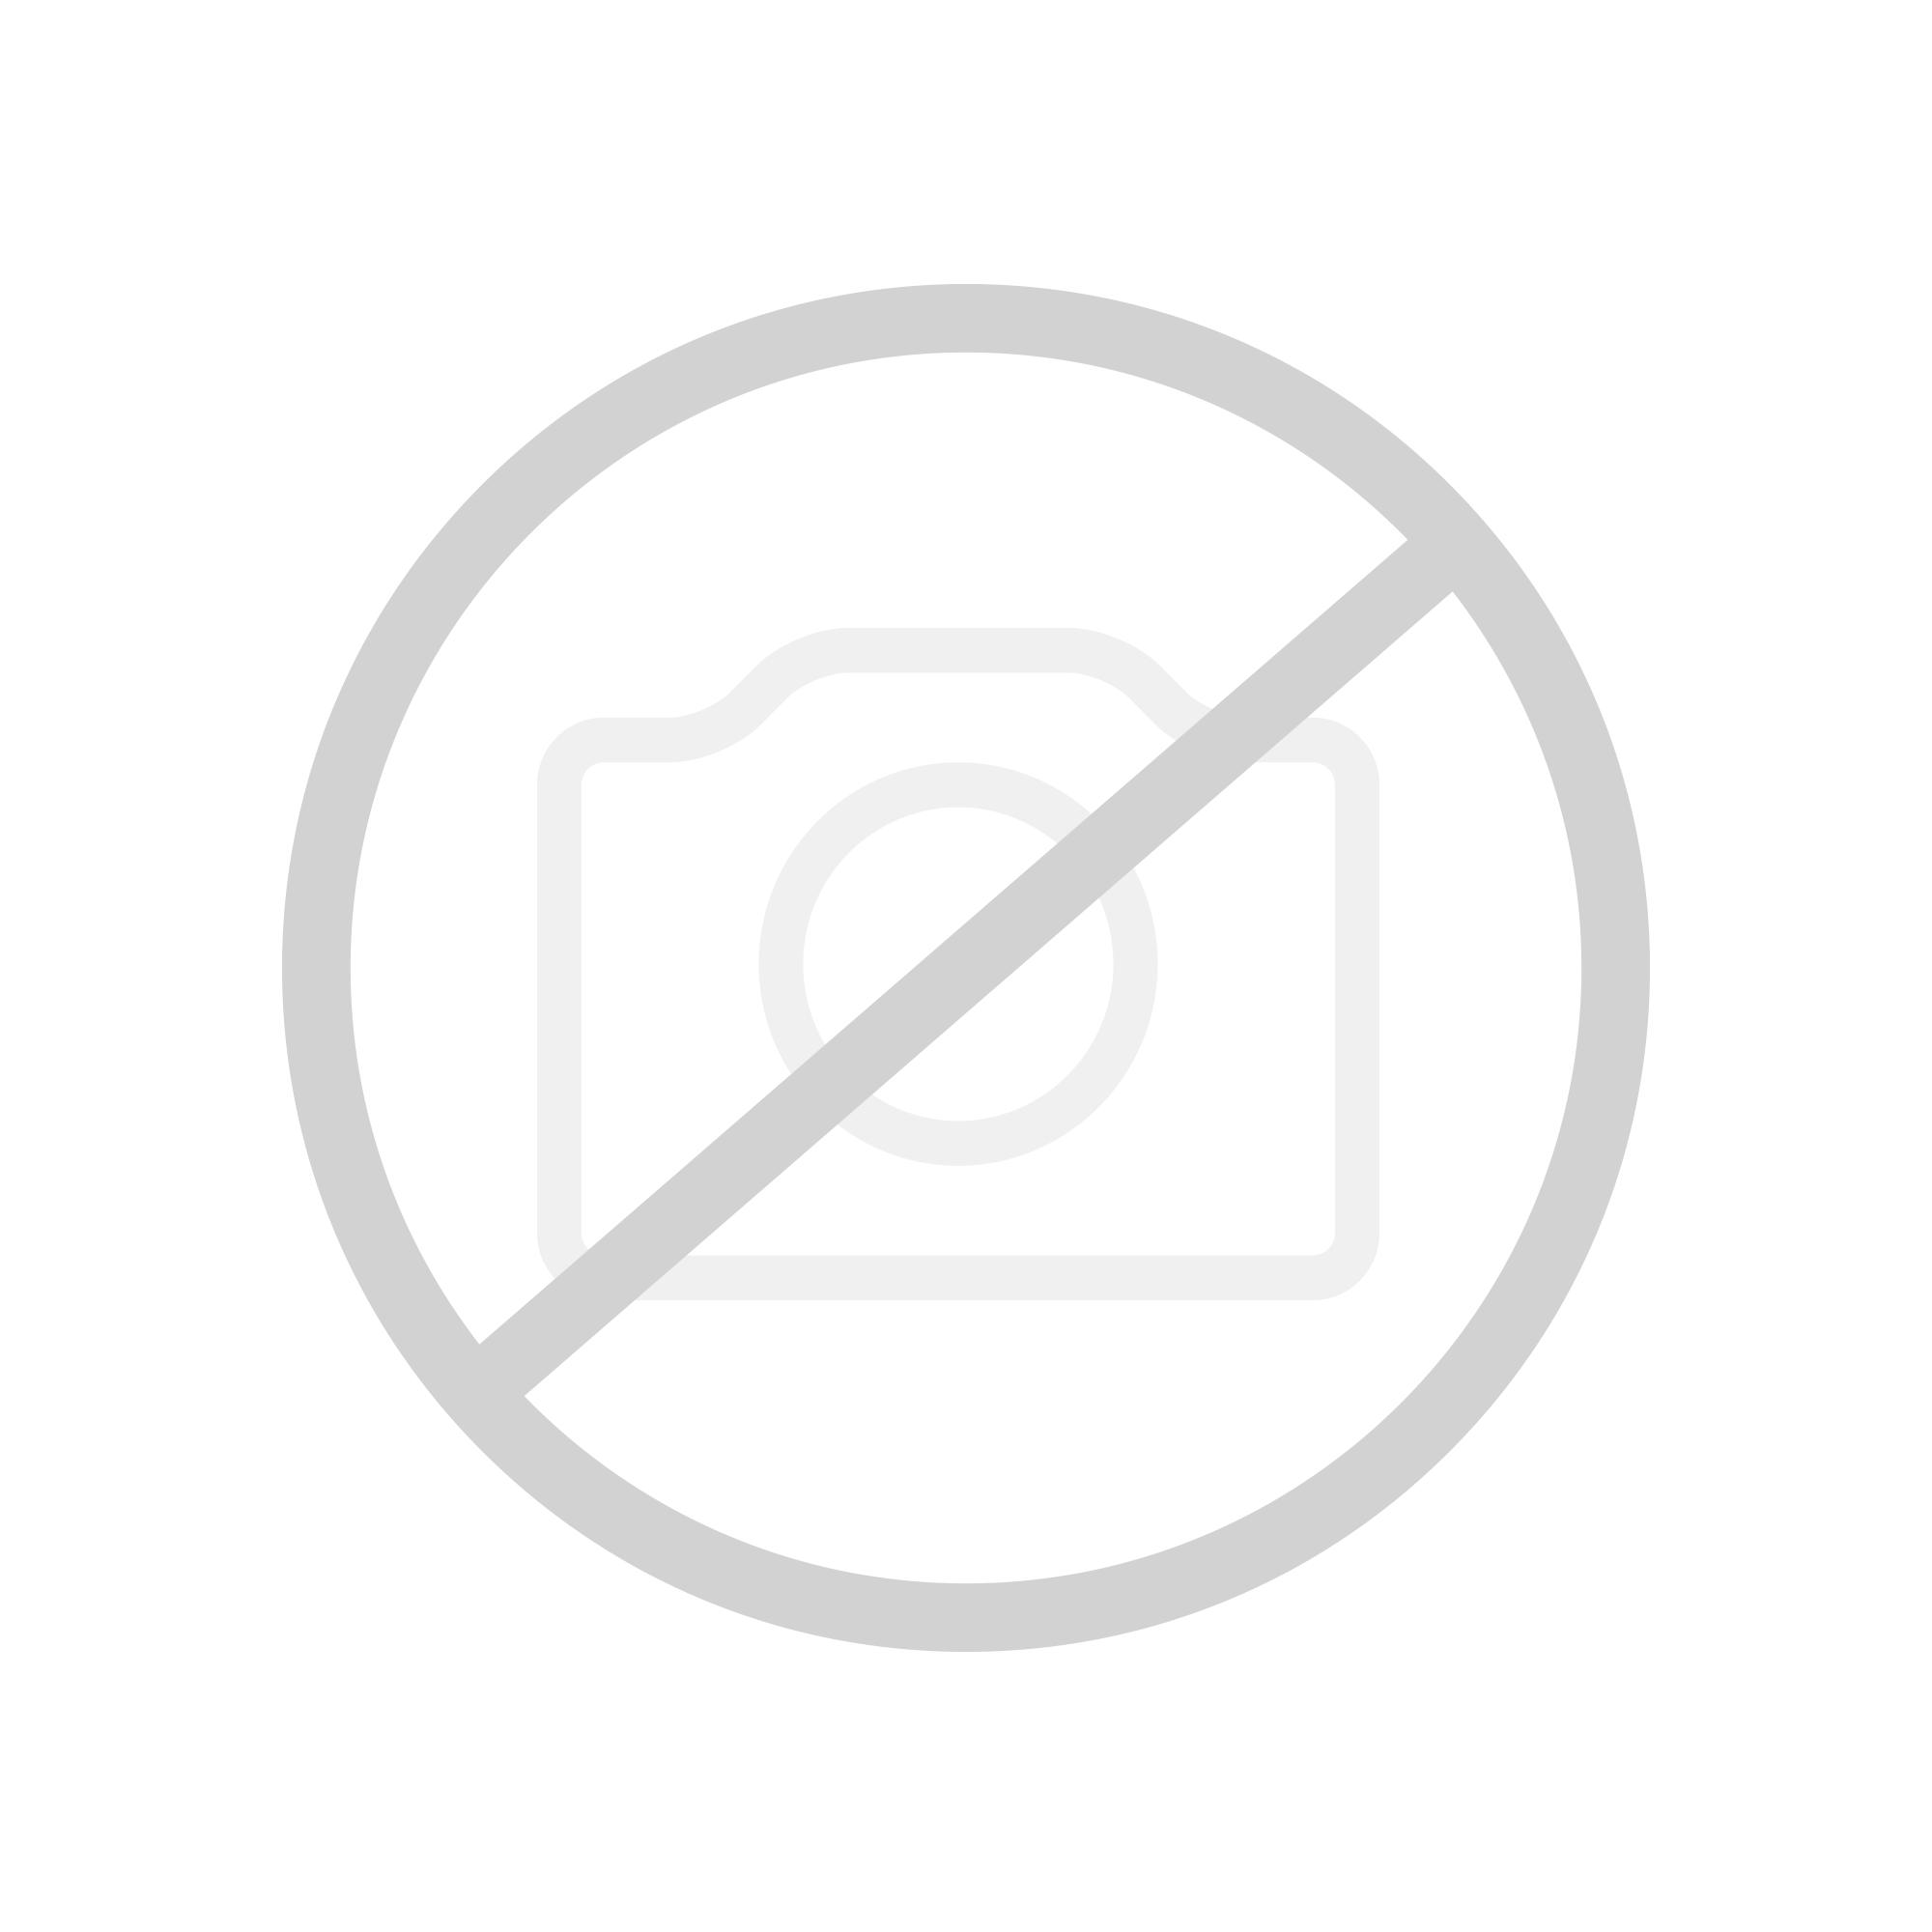 Wandarmaturen bad grohe  Grohe Armaturen online bestellen im REUTER Shop